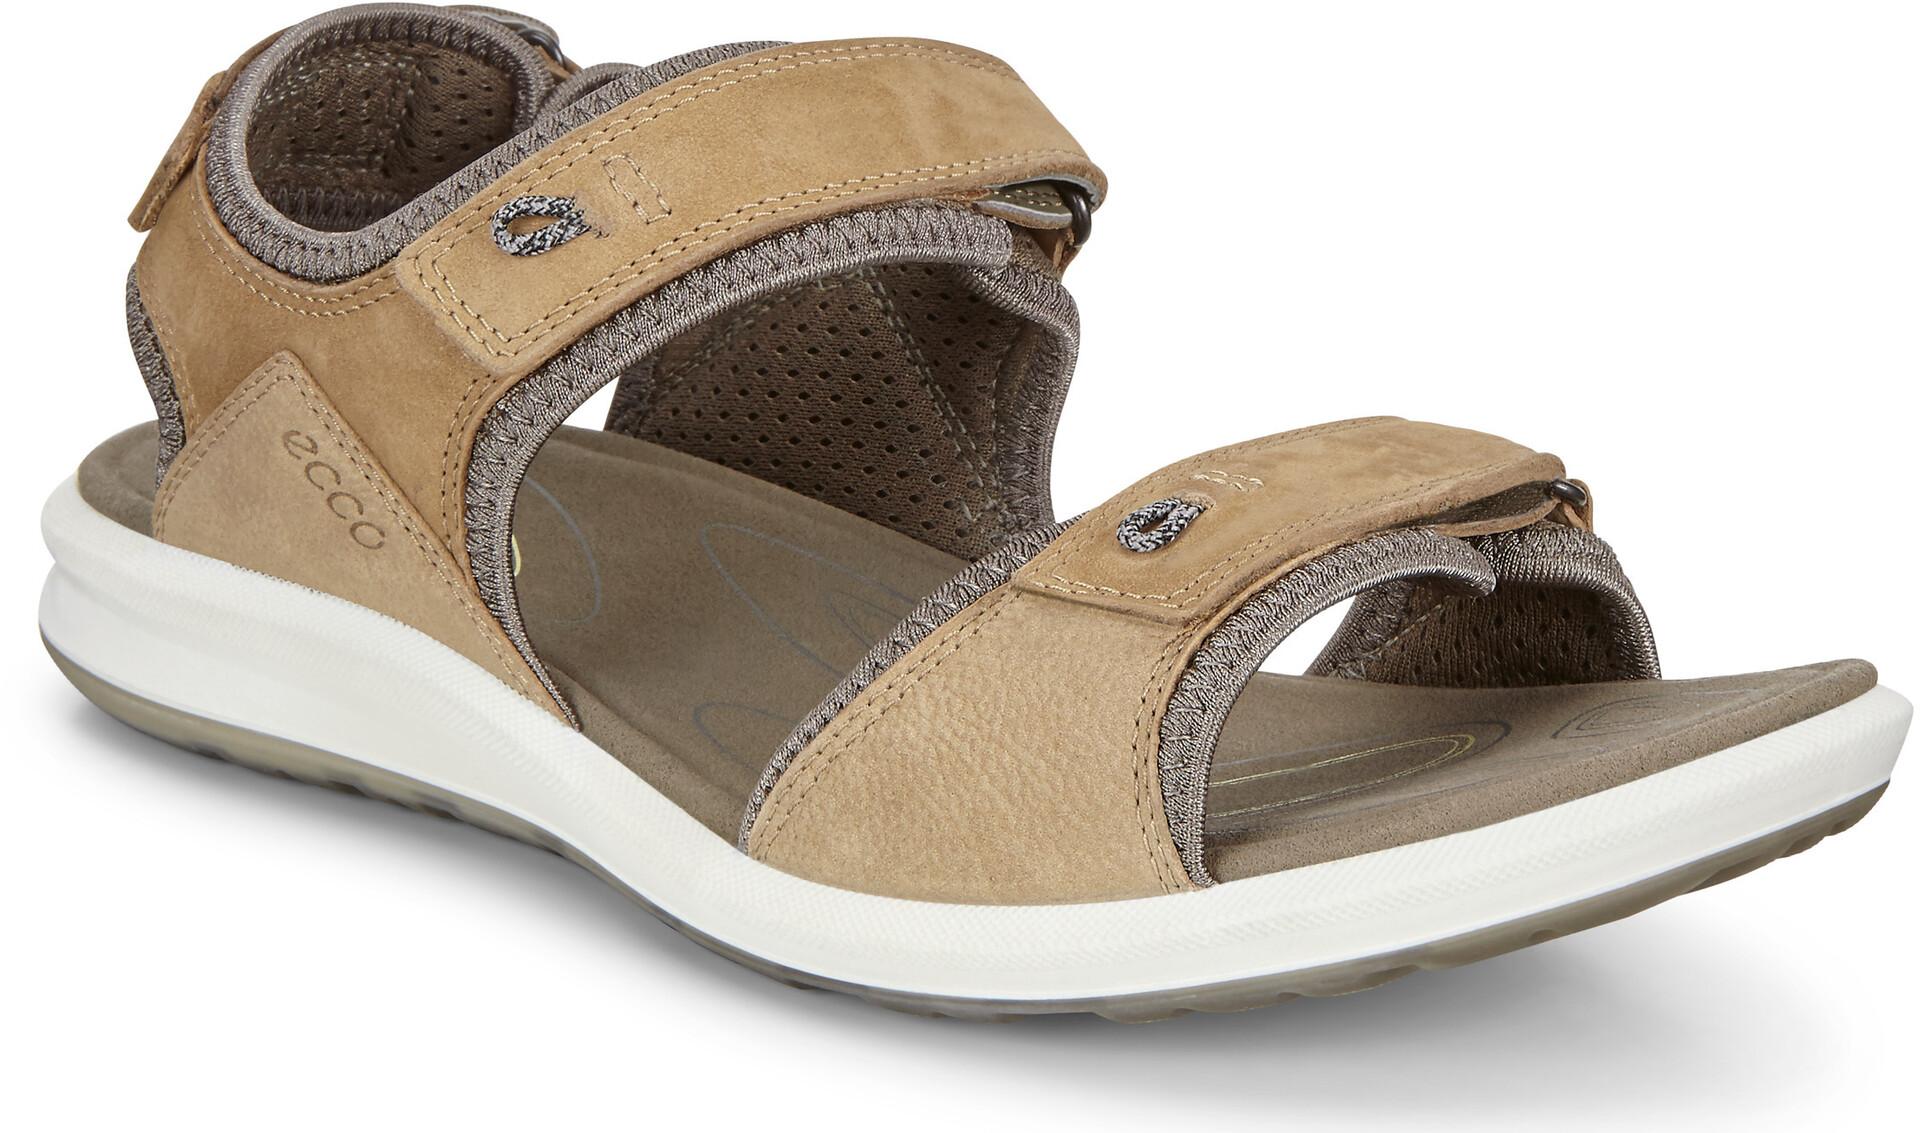 ECCO Cruise II Sandals Damen navajo brownblack